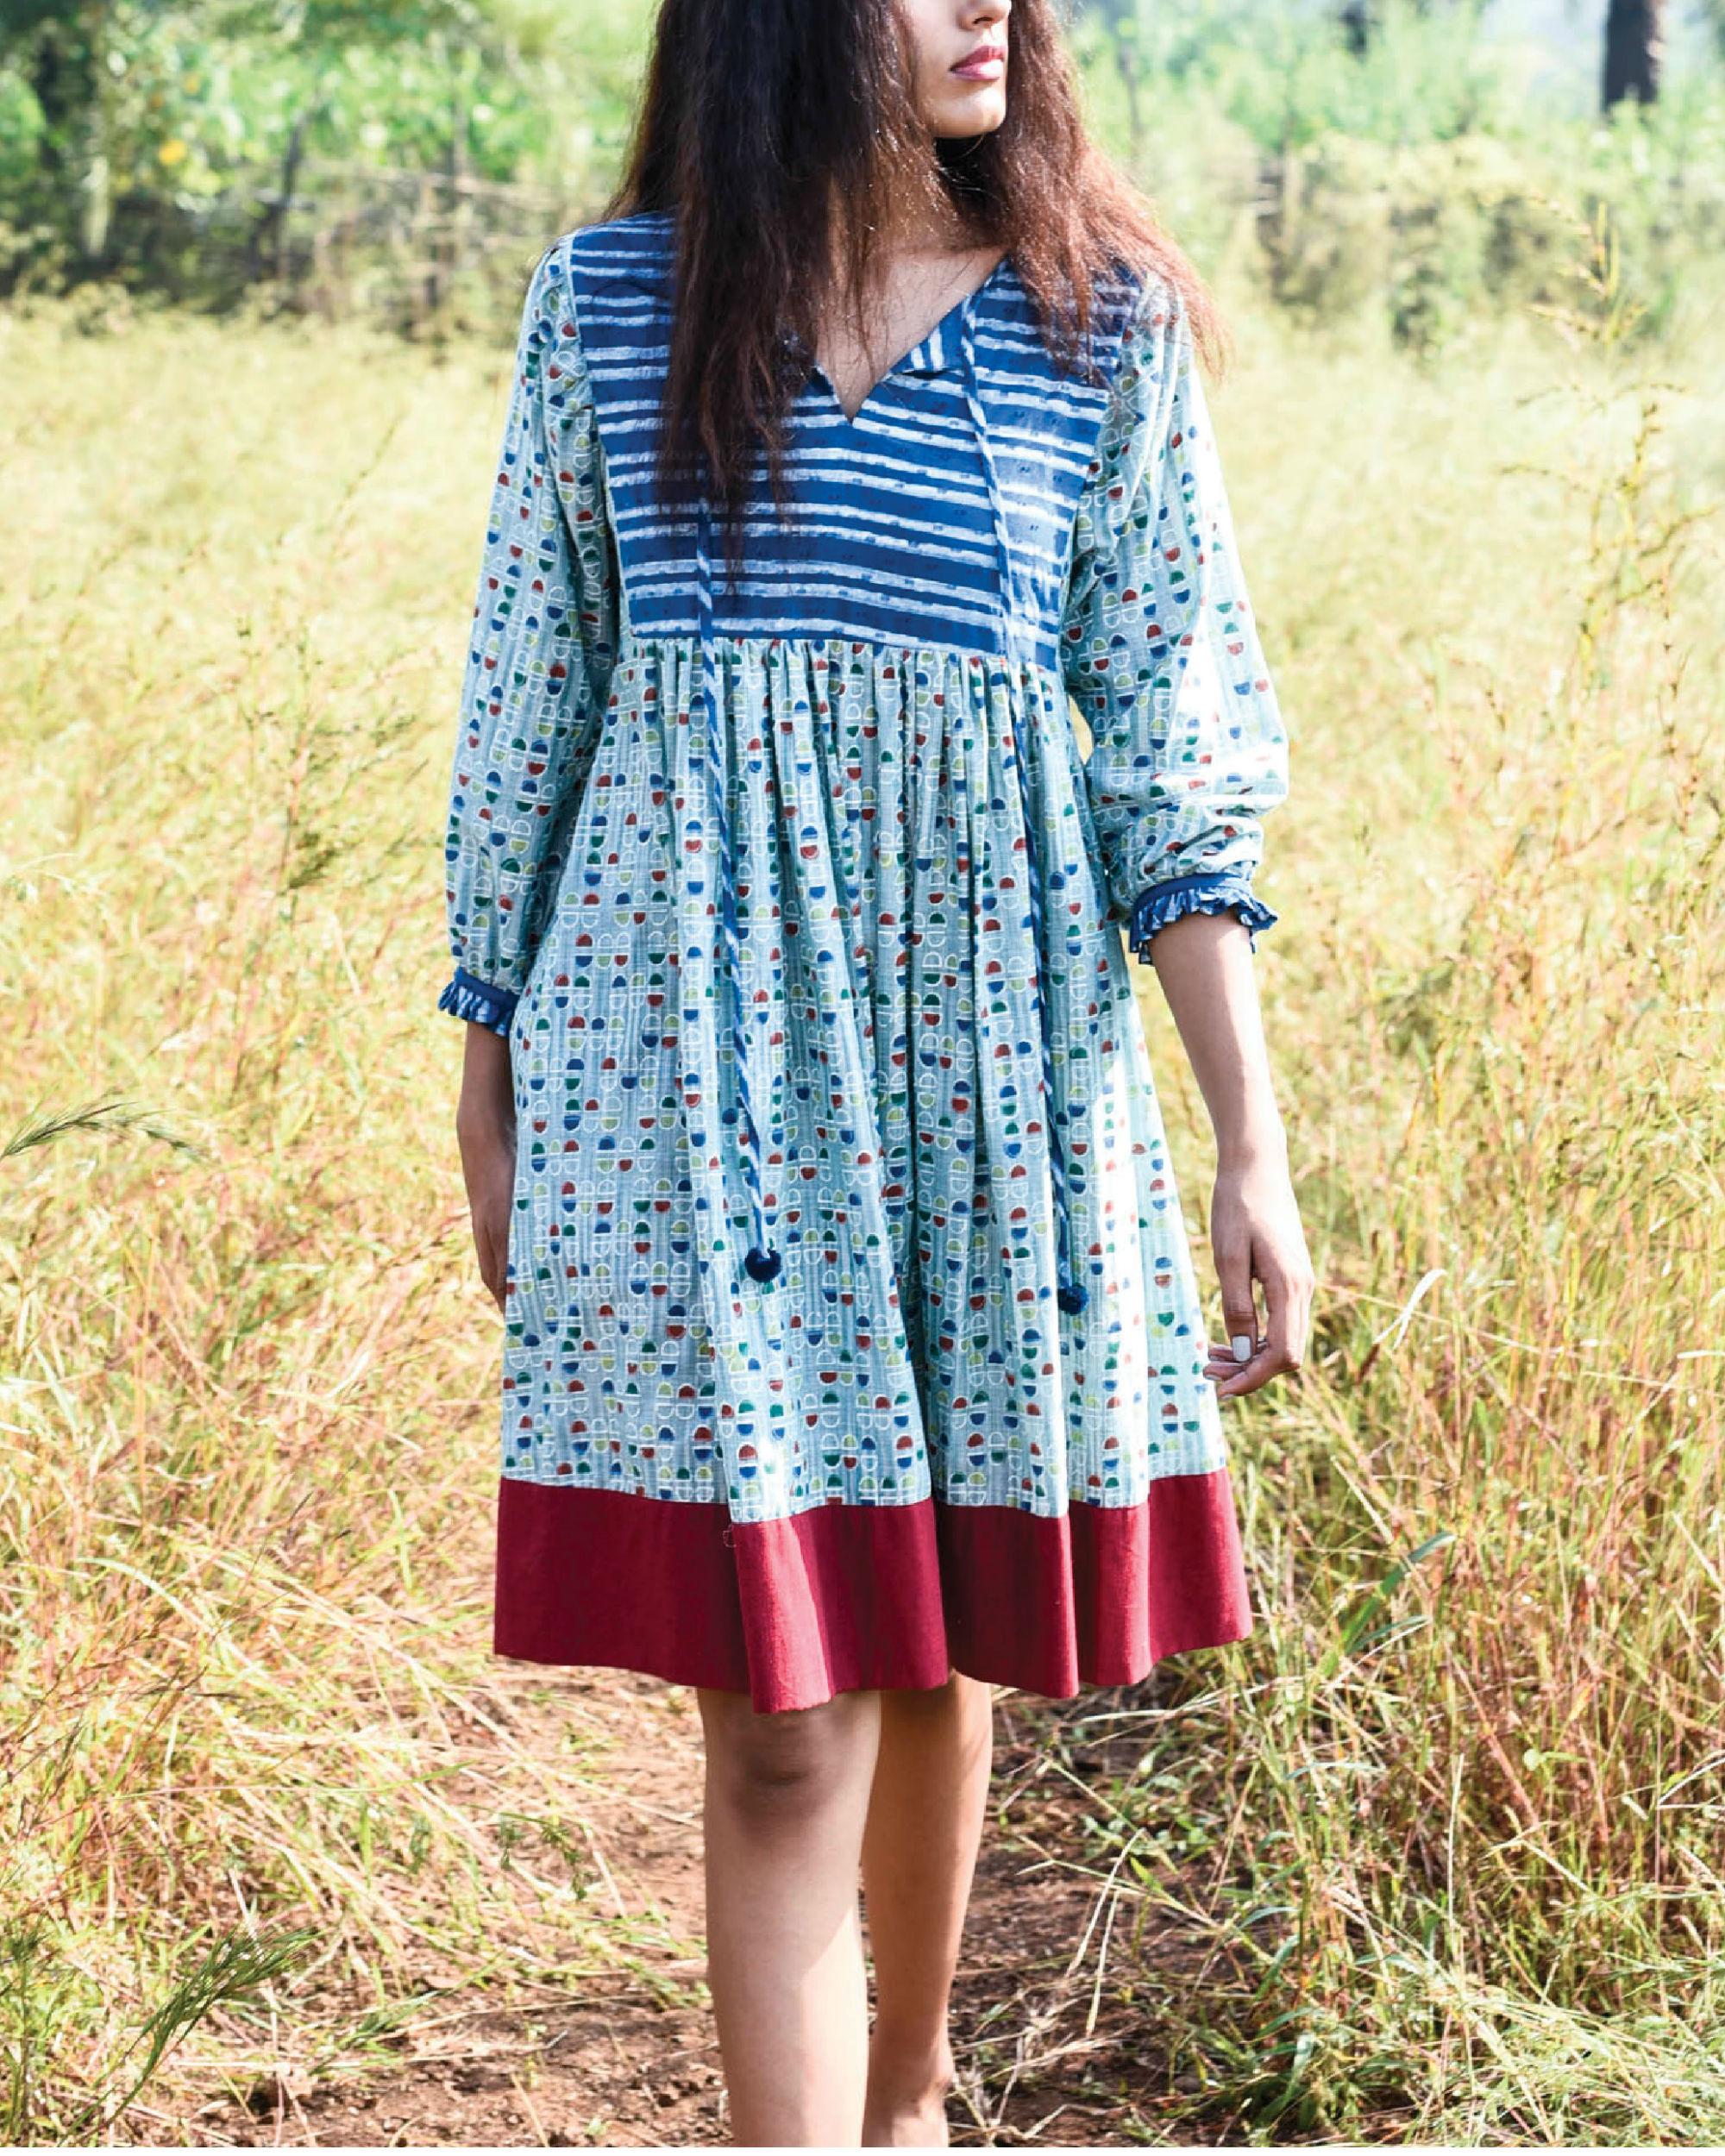 Sea foam peasant dress